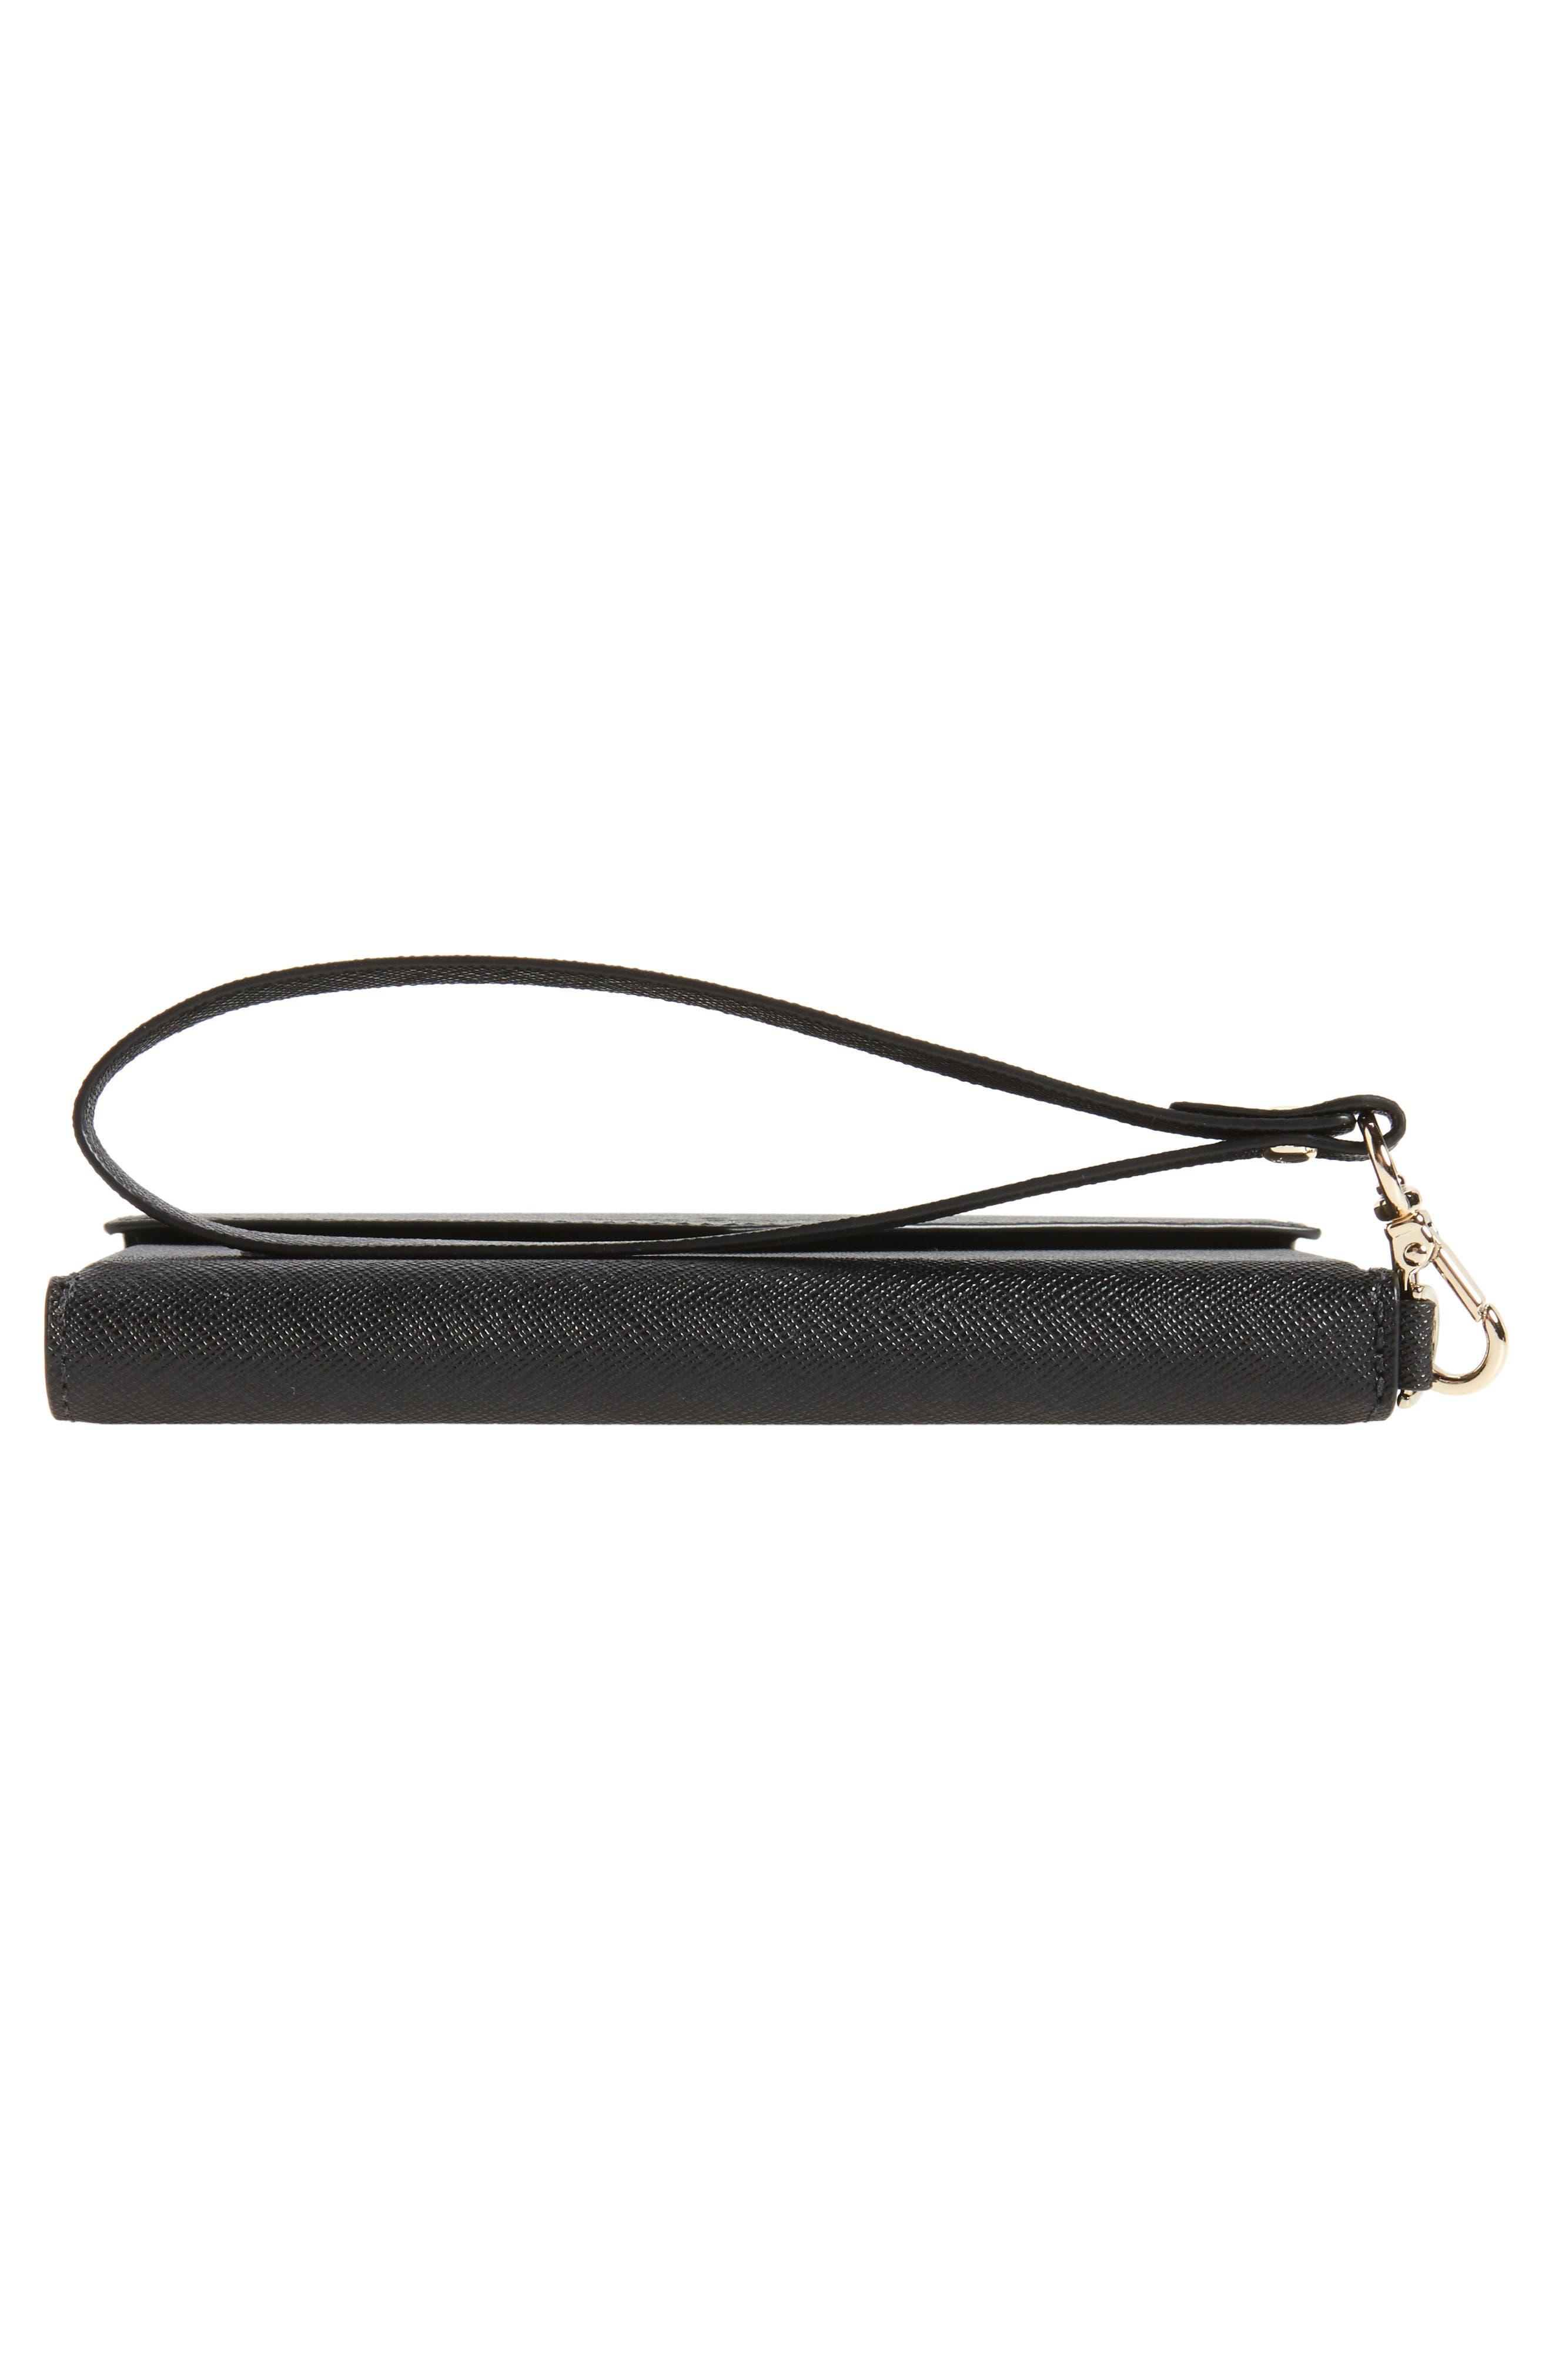 iPhone 7/8 & 7/8 Plus leather wristlet,                             Alternate thumbnail 6, color,                             BLACK